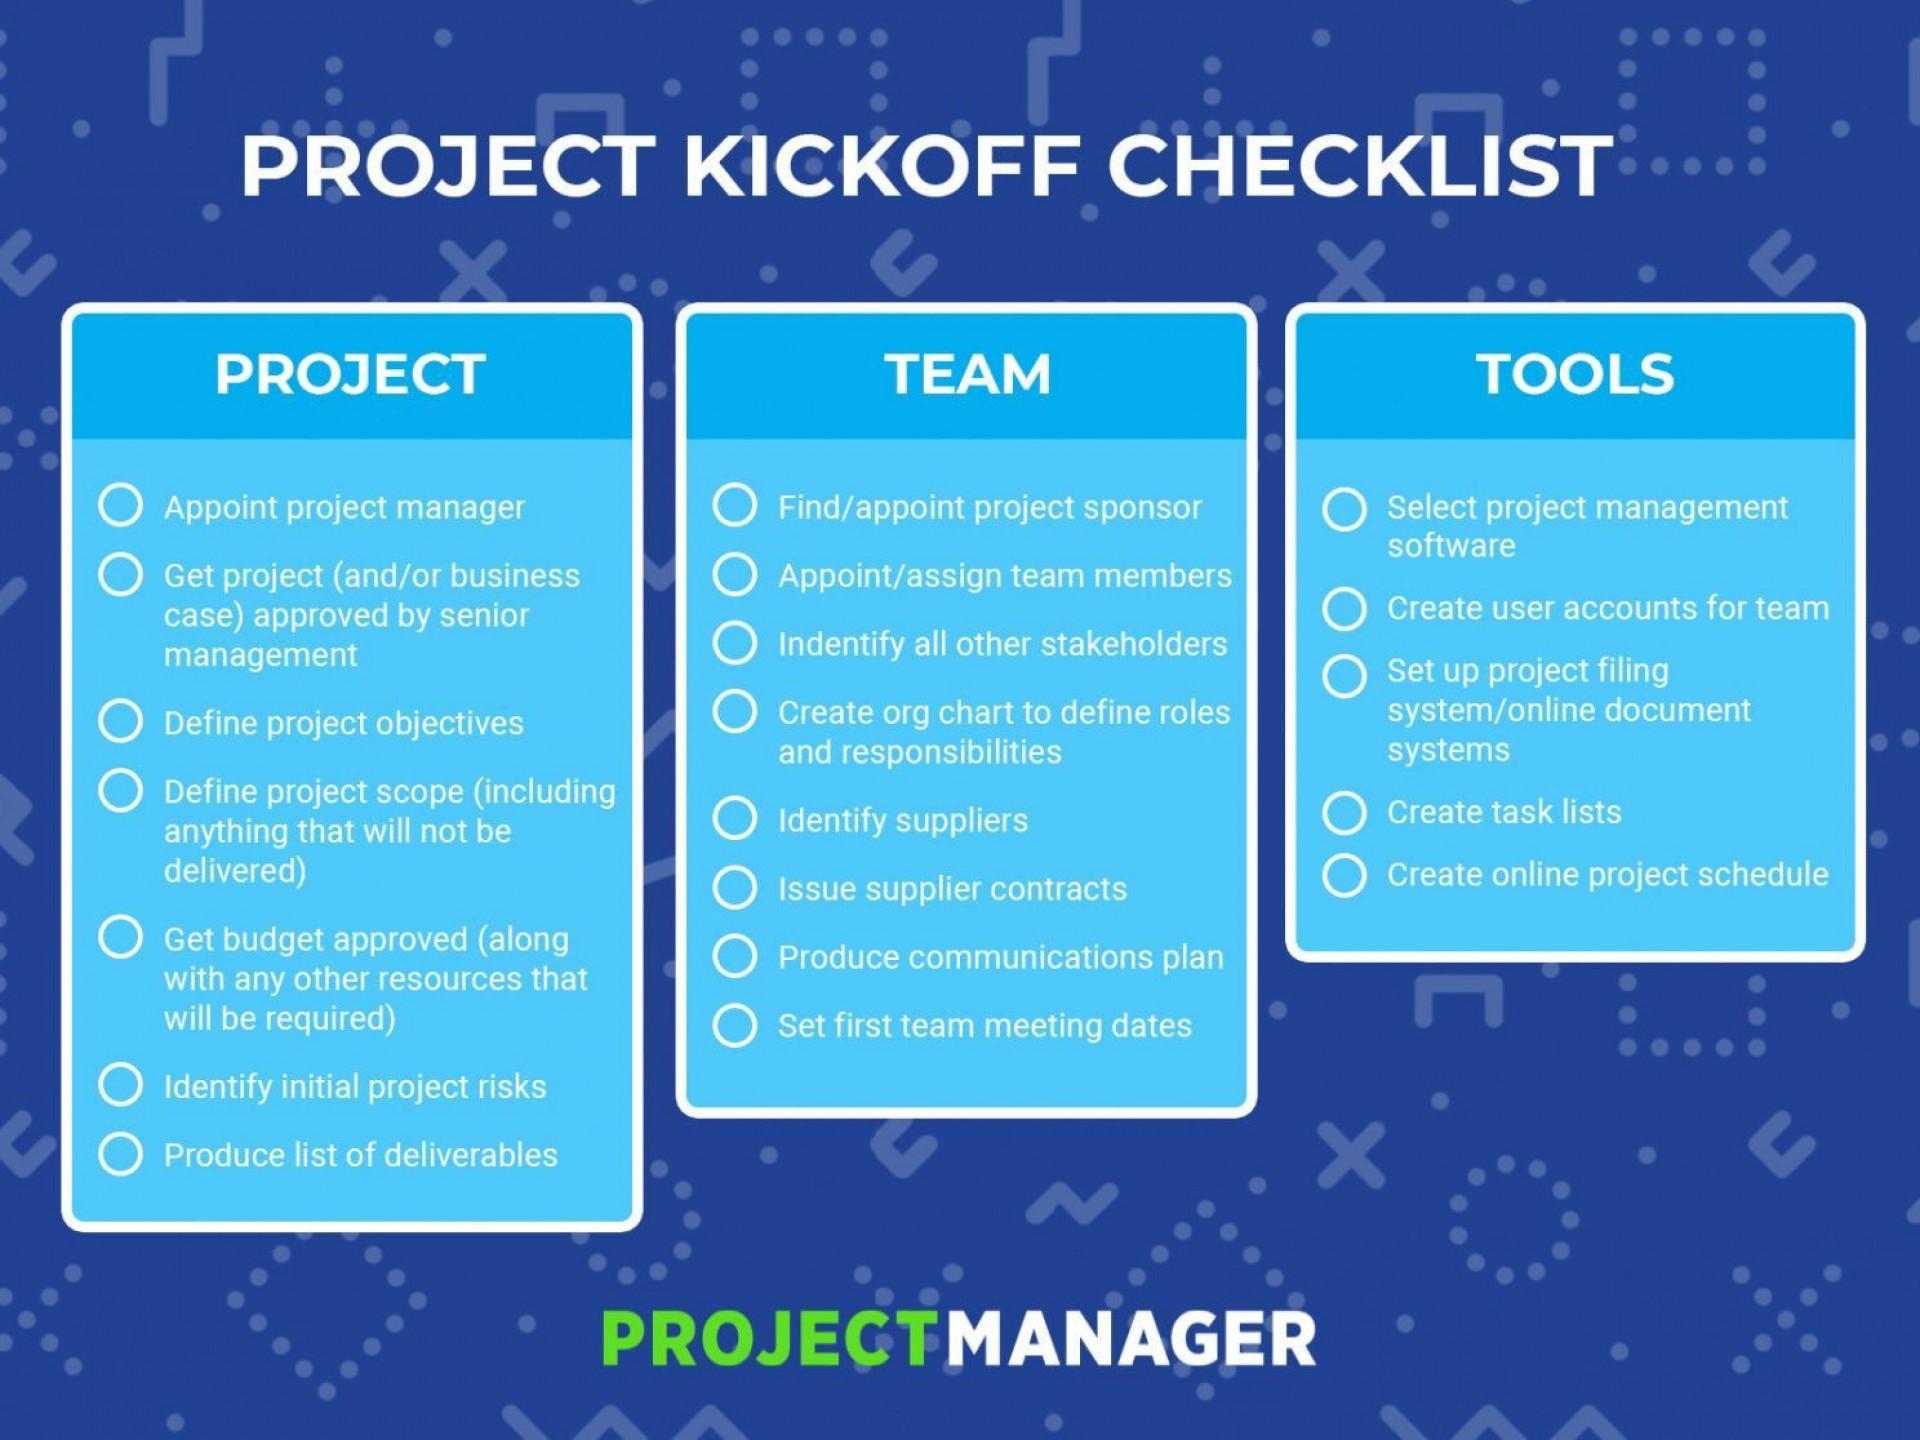 006 Striking Project Management Kick Off Meeting Agenda Template Sample  Kickoff1920